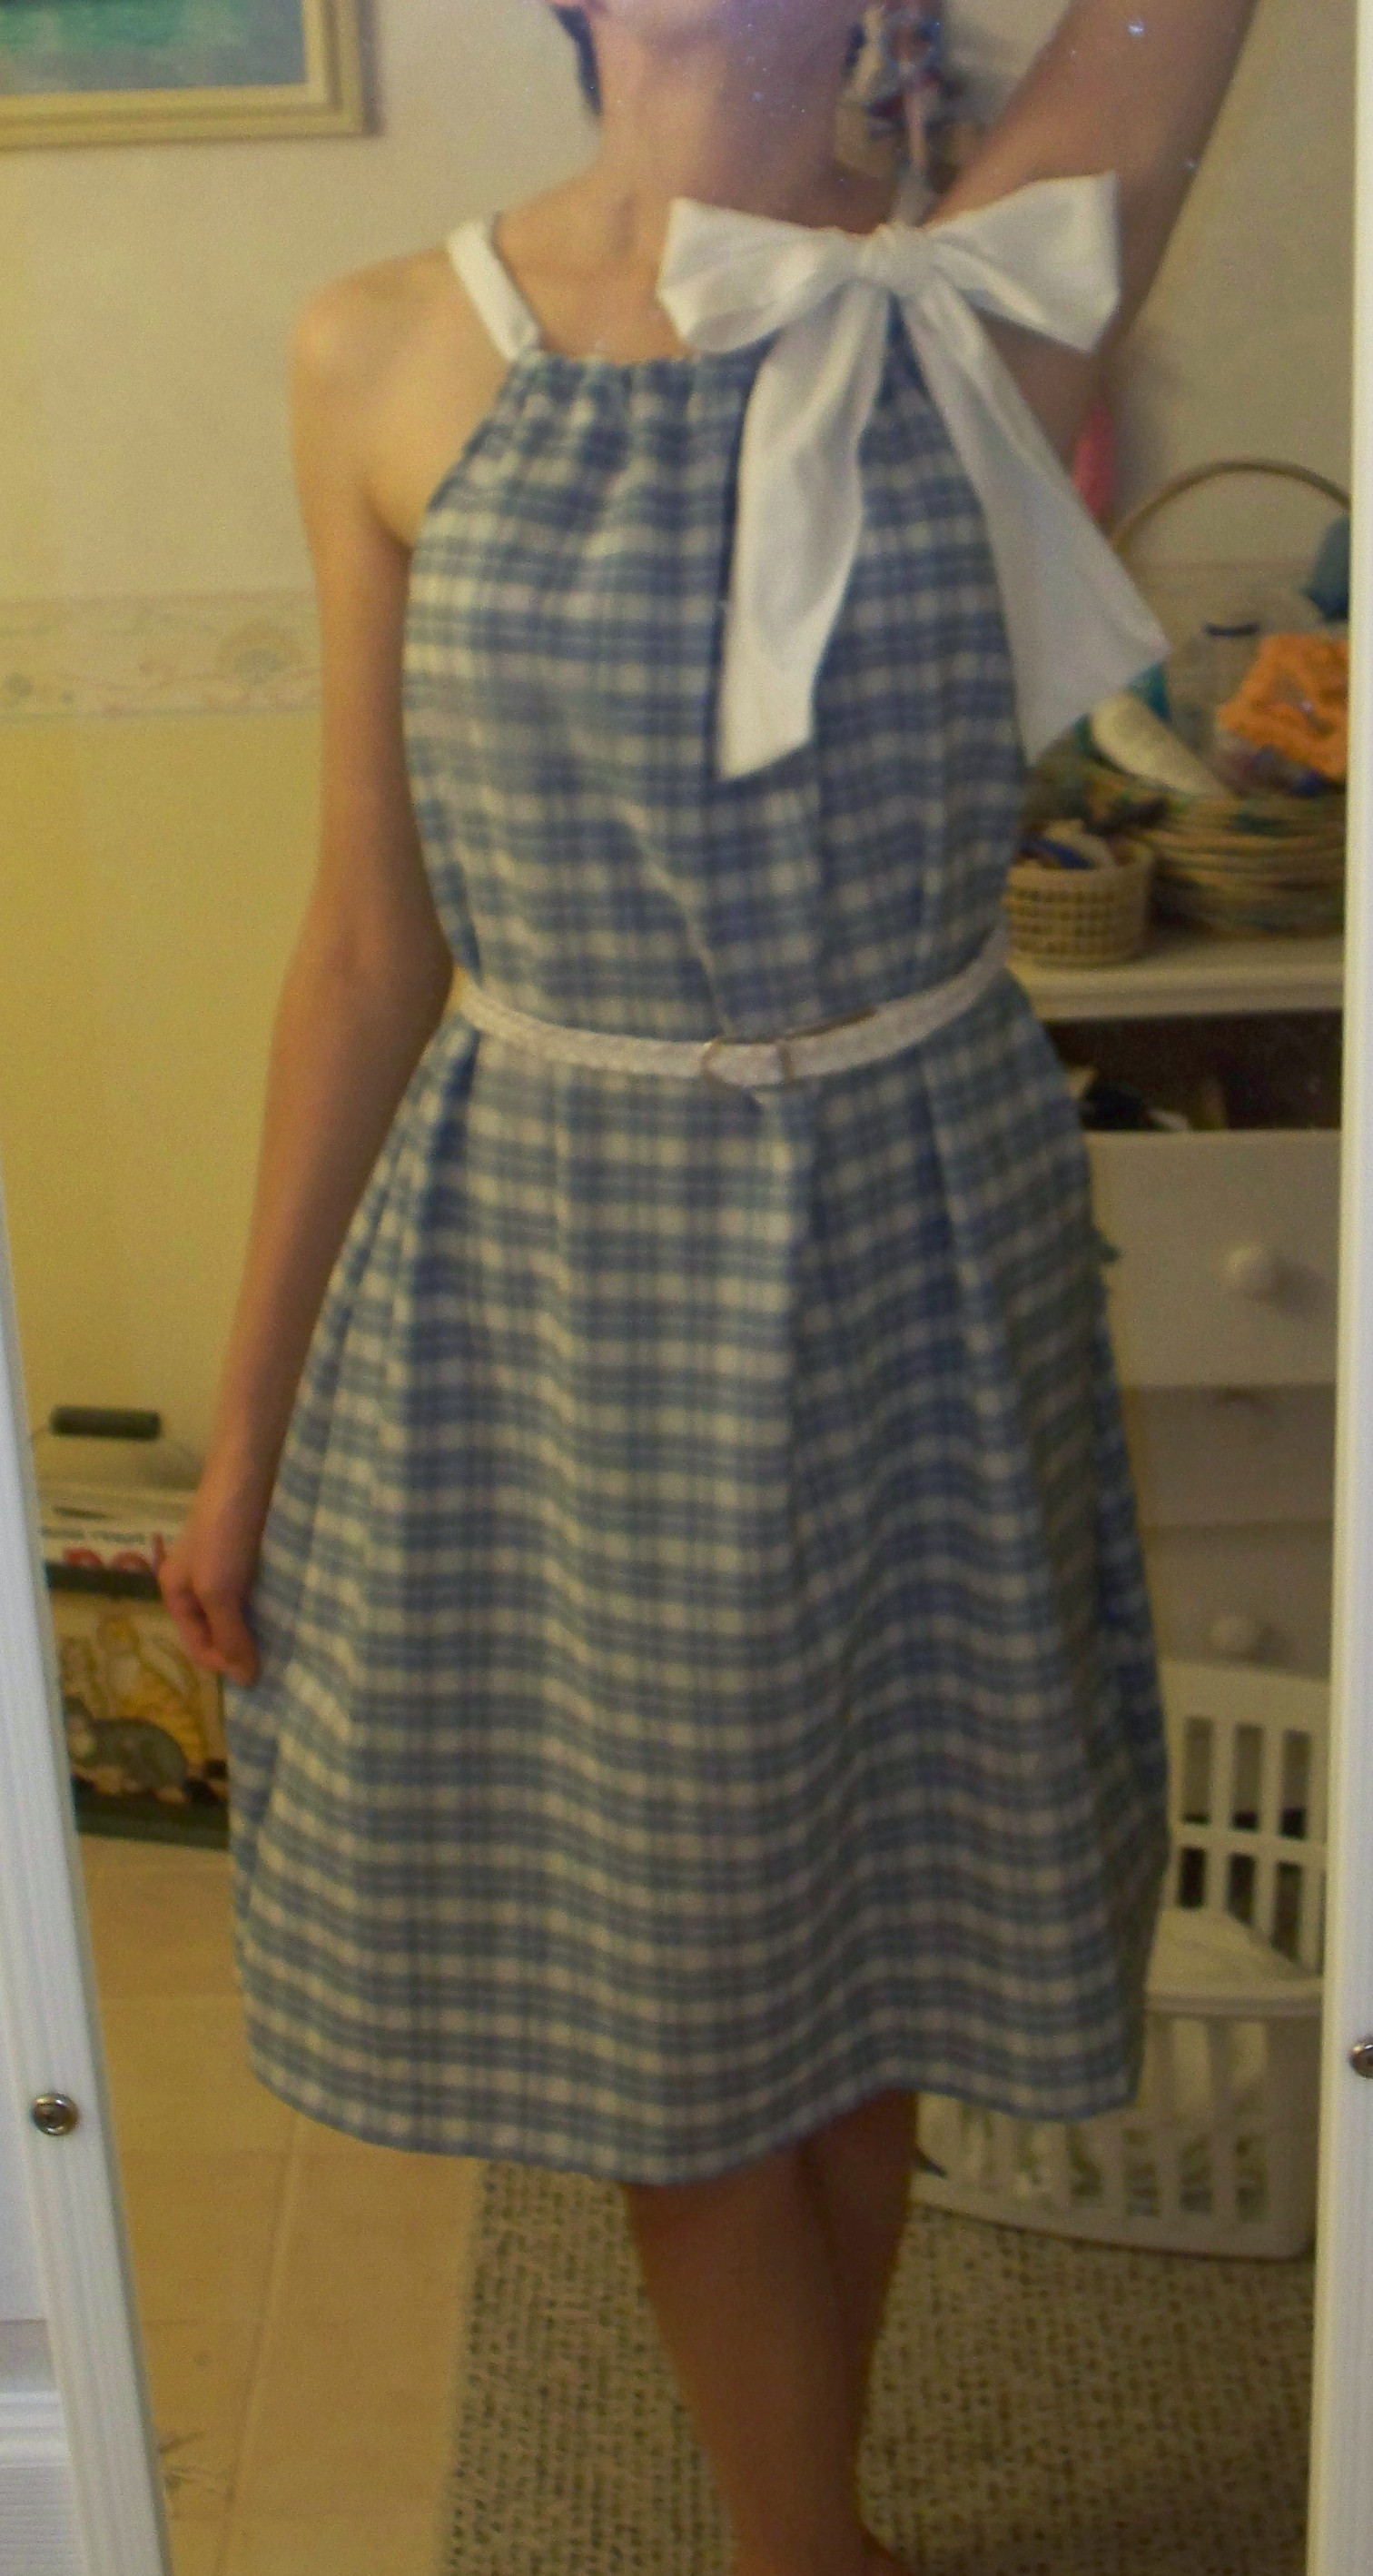 & big girl pillowcase dress \u2013 Sewing Projects | BurdaStyle.com pillowsntoast.com